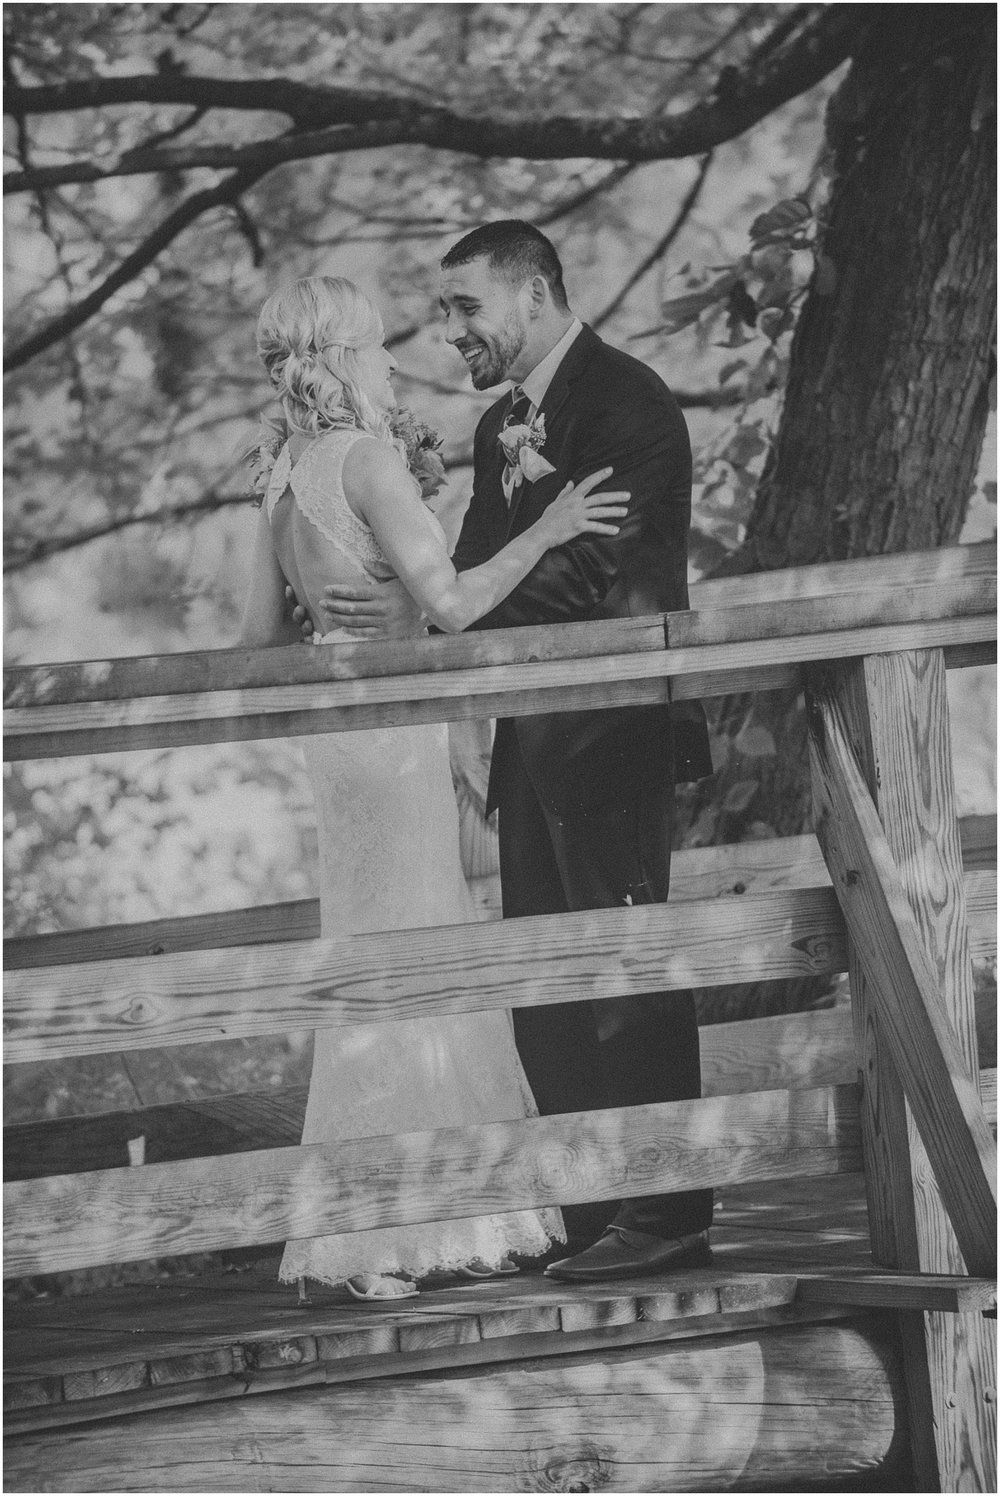 waterloo-village-waterloo village-wedding-outdoor wedding-rustic-boemian-new jersey-bride-groom-wedding party-davids bridal-wedding dress-wedding-first kiss-intimate wedding_0357.jpg